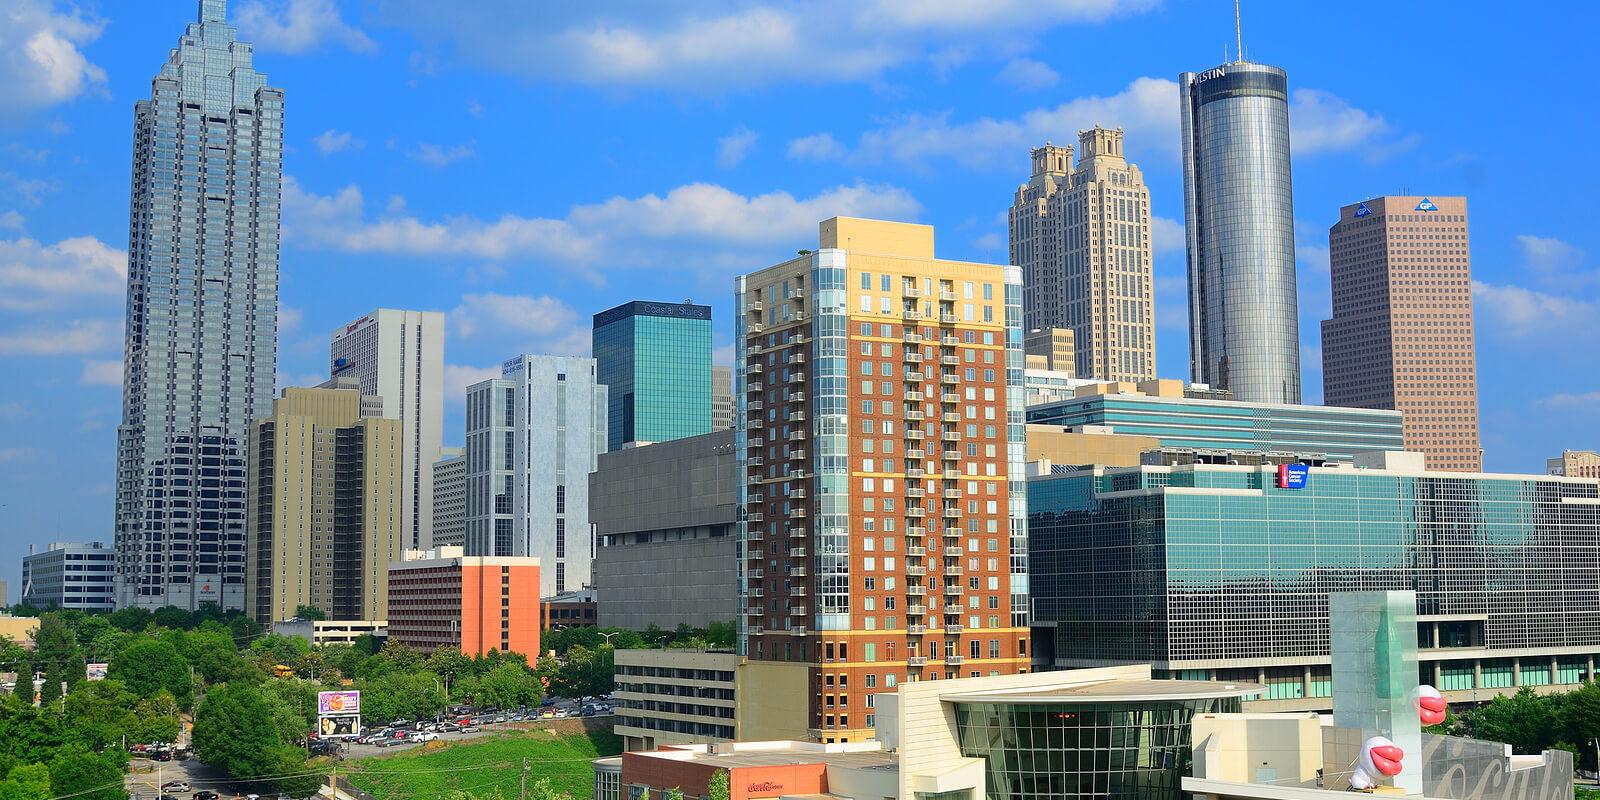 Flexible-Jobs-in-Atlanta-Georgia-Hiring-Now.jpg